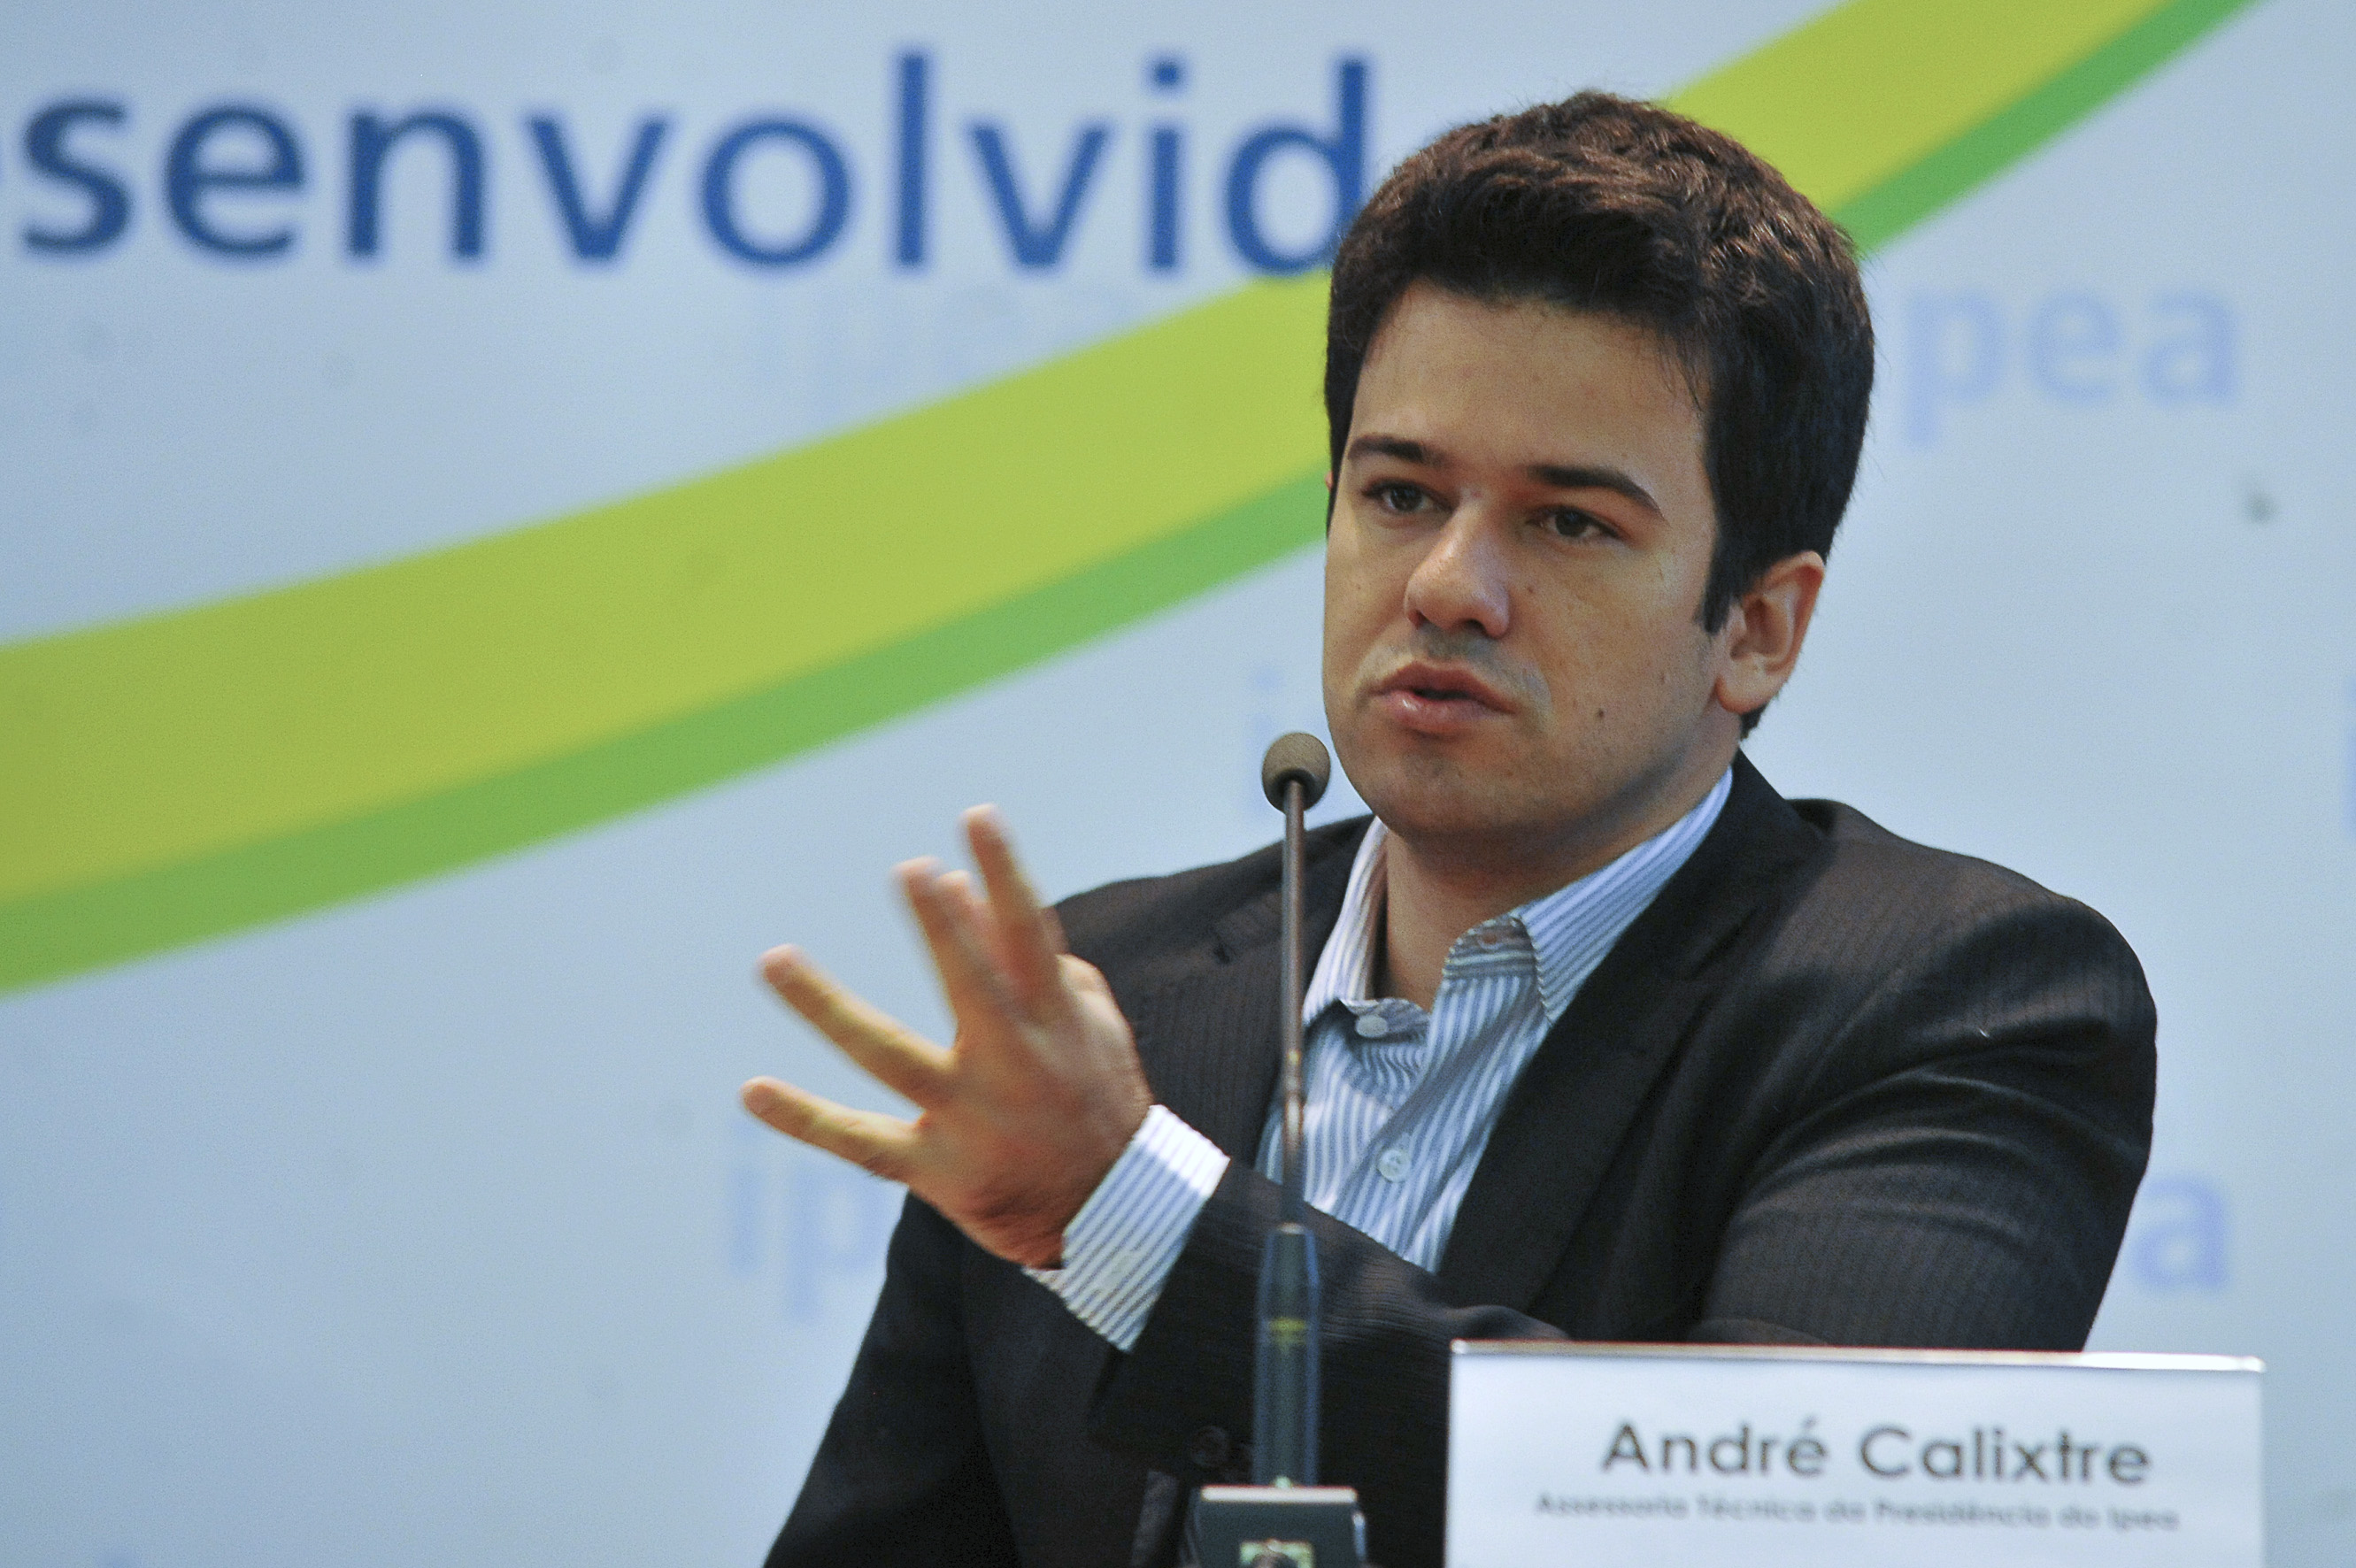 André Calixtre. Fotografia: Agência Brasil